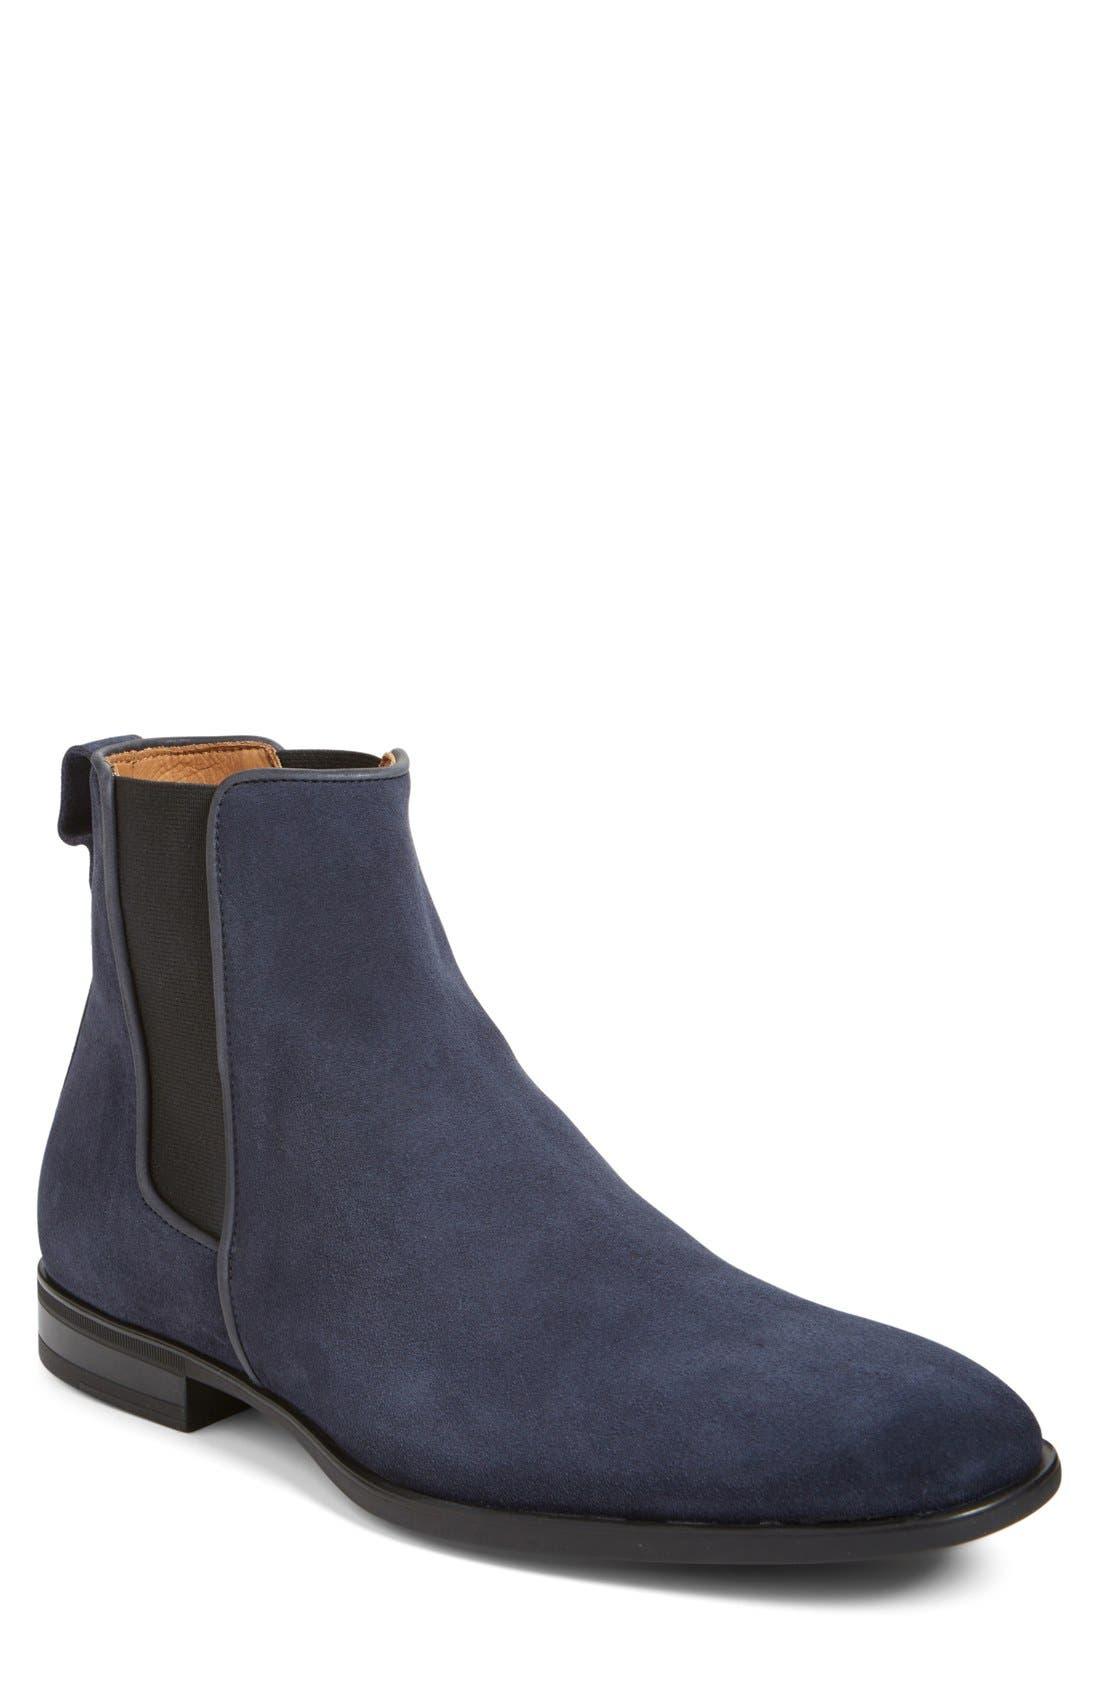 Alternate Image 1 Selected - Aquatalia'Adrian' Weatherproof Chelsea Boot (Men)